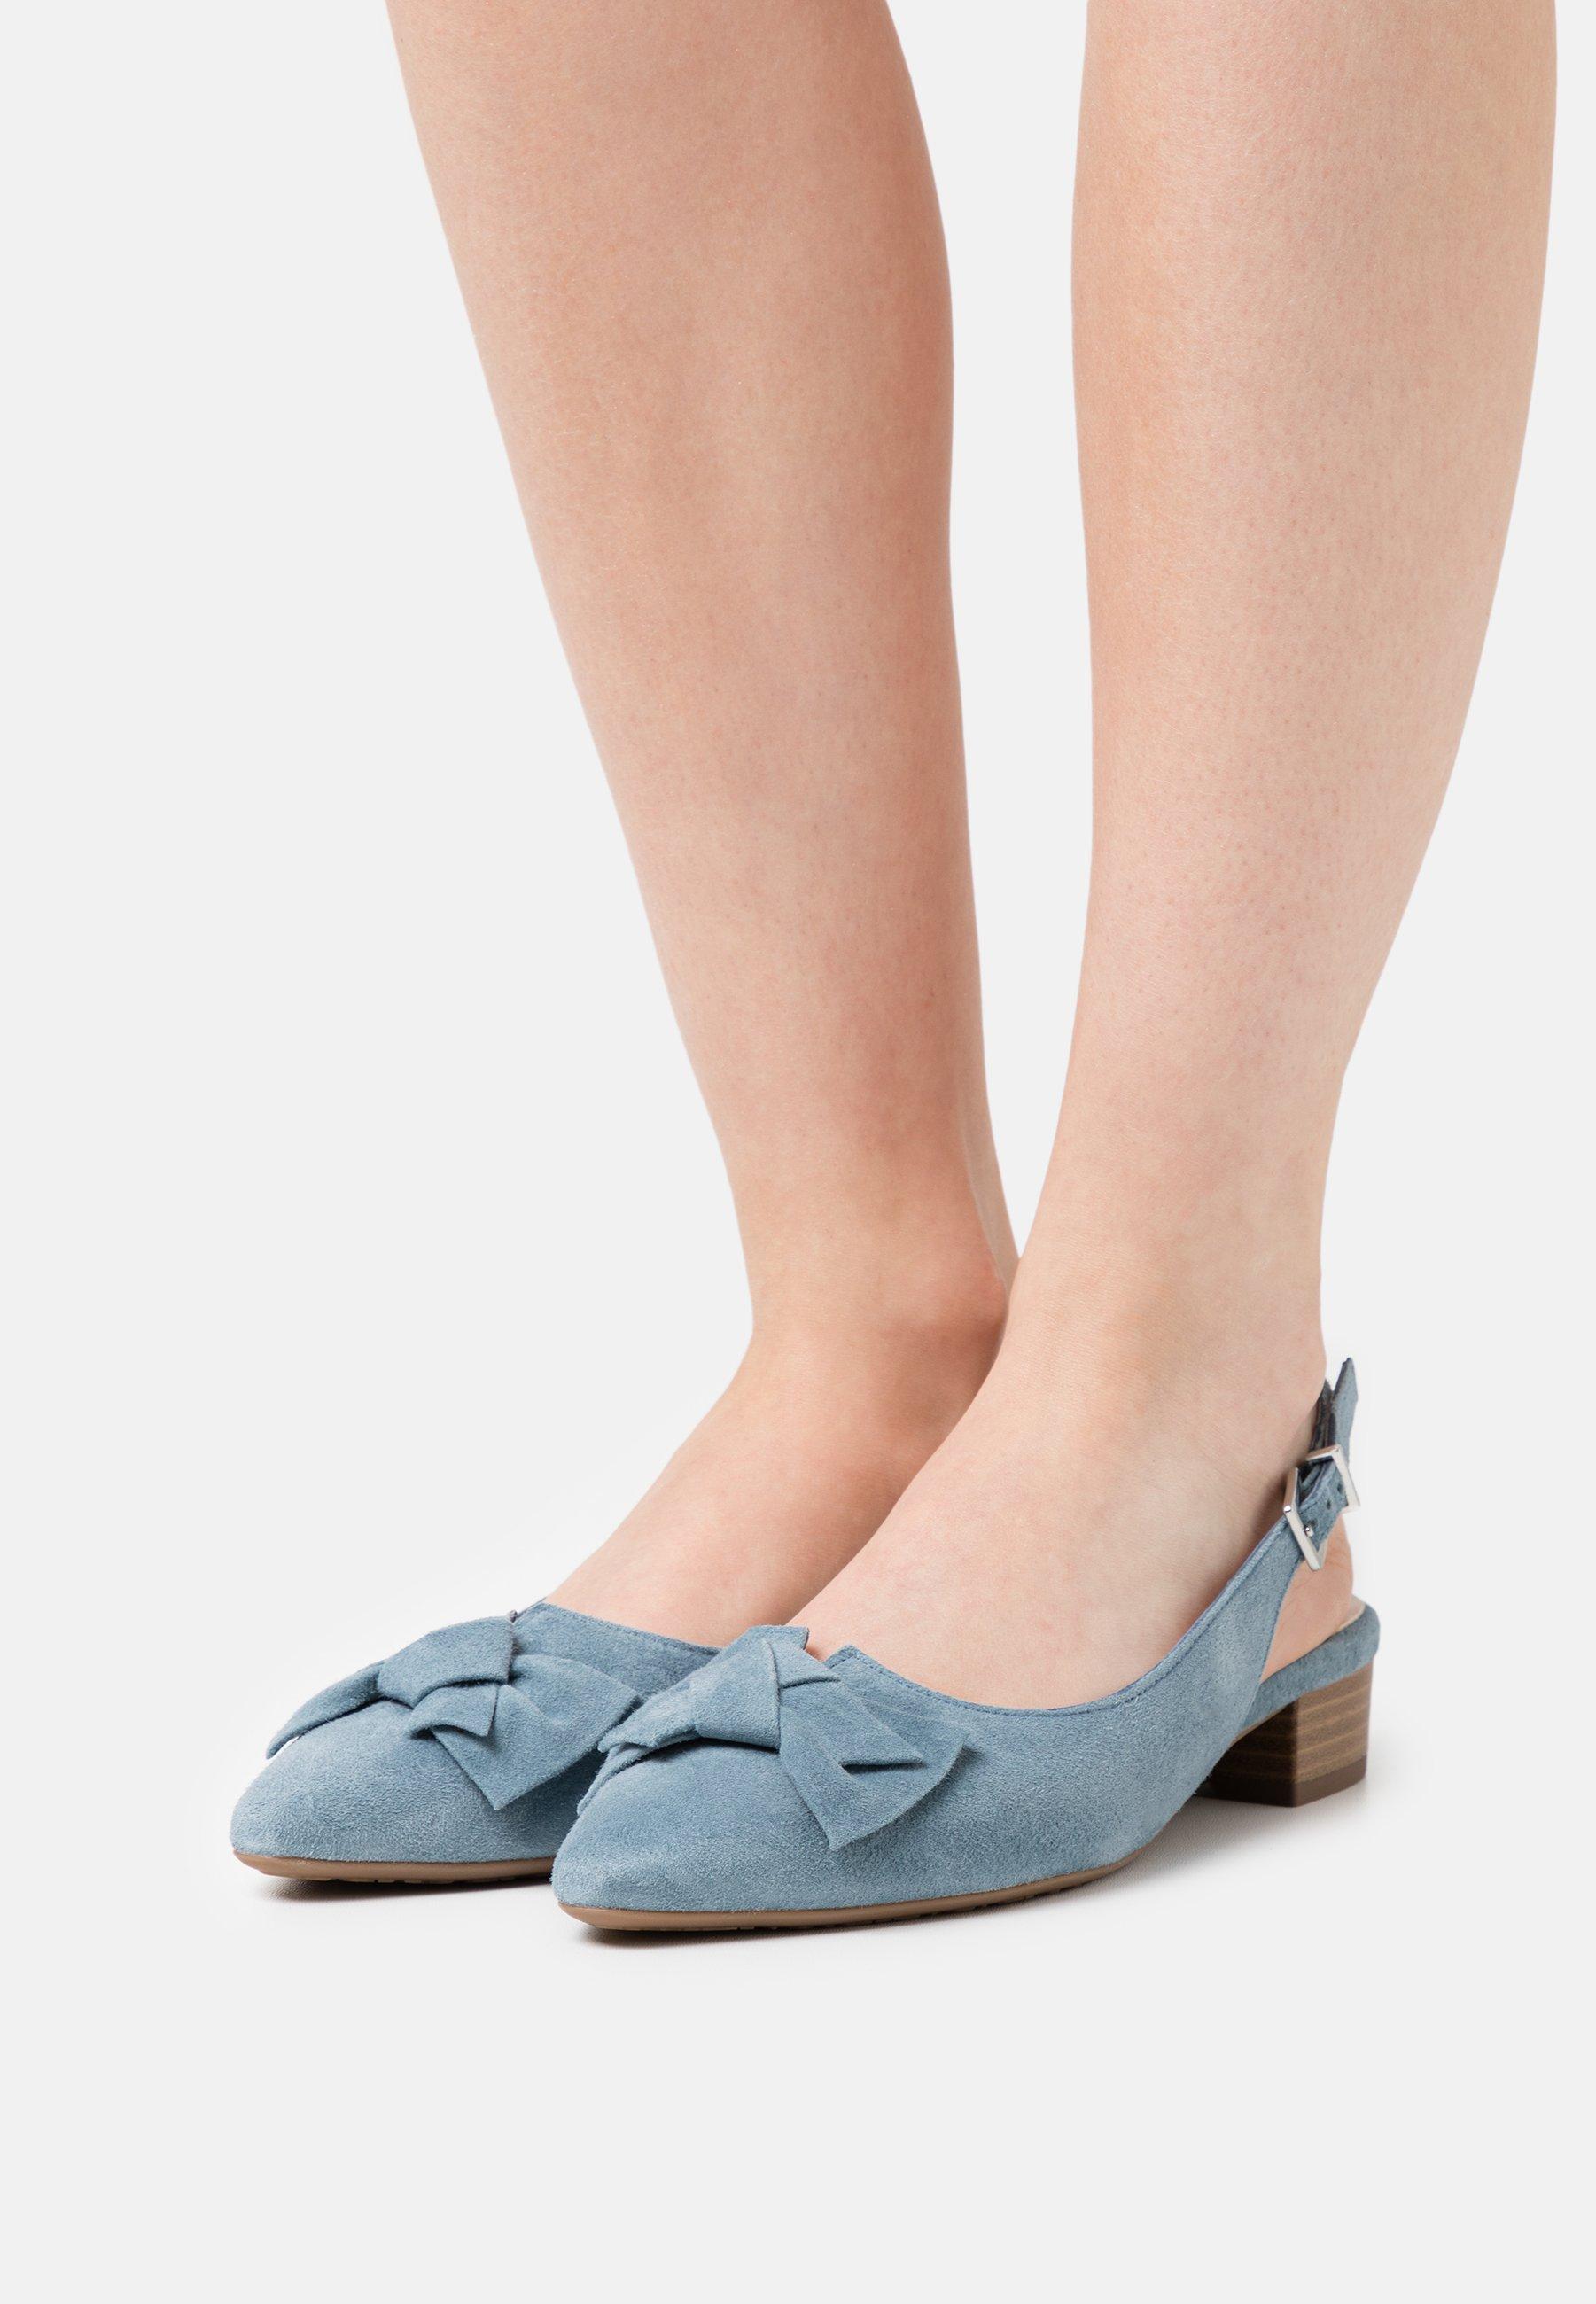 Femme ADALIA - Escarpins - jeans